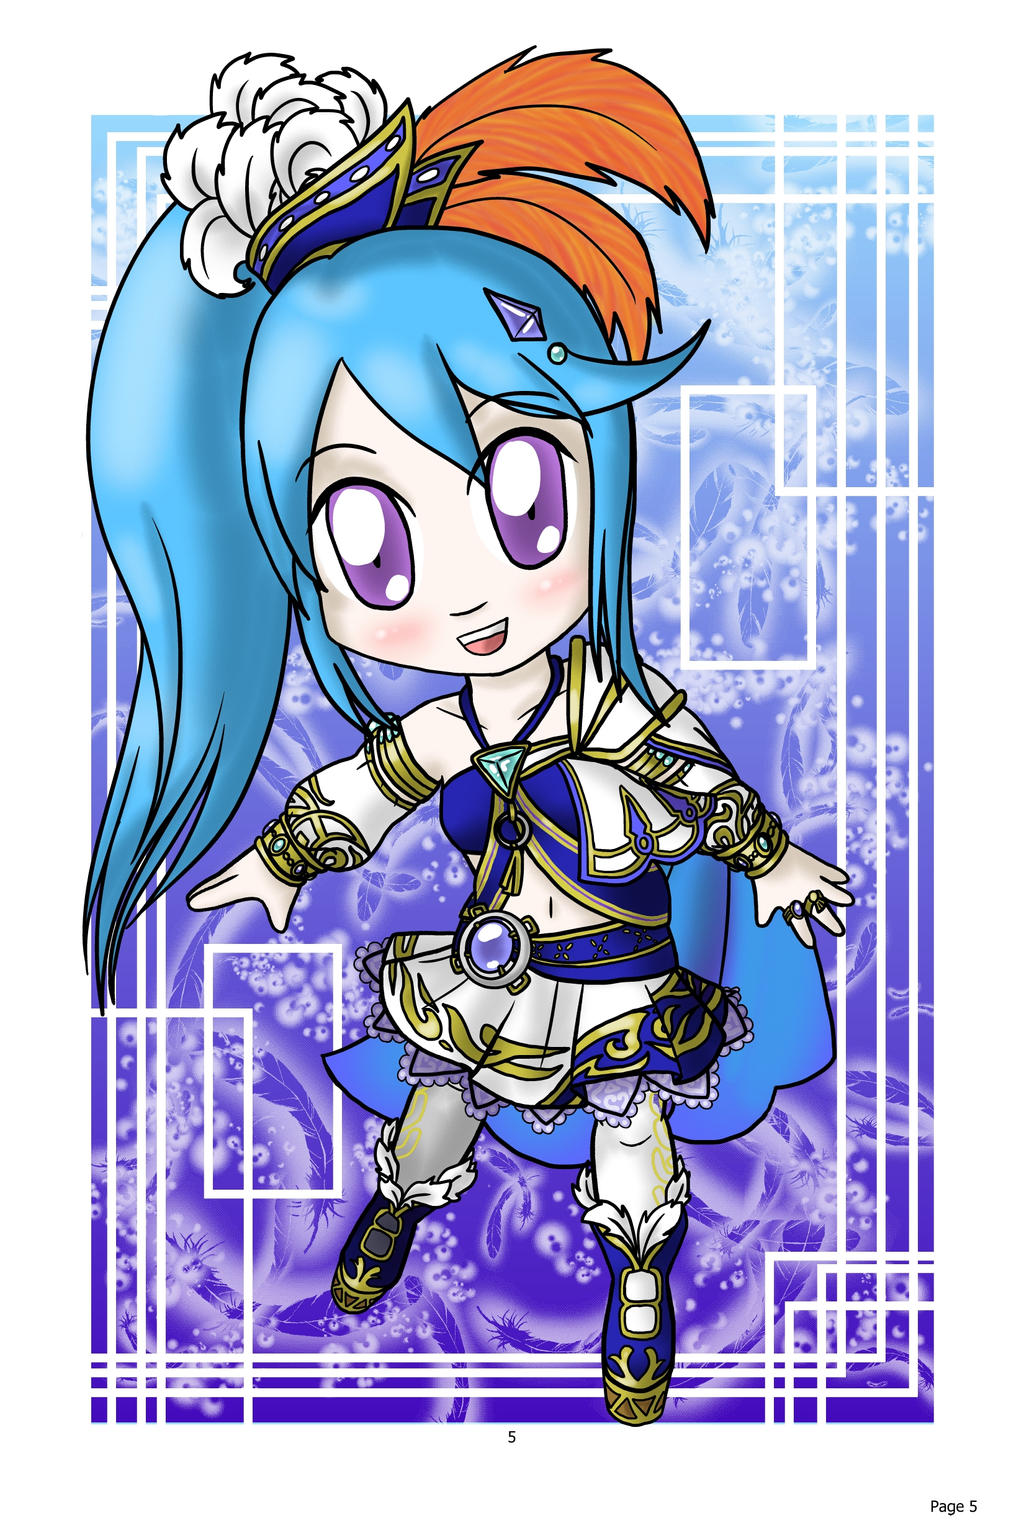 Chibi Lana: Hyrule Warrior by lillilotus